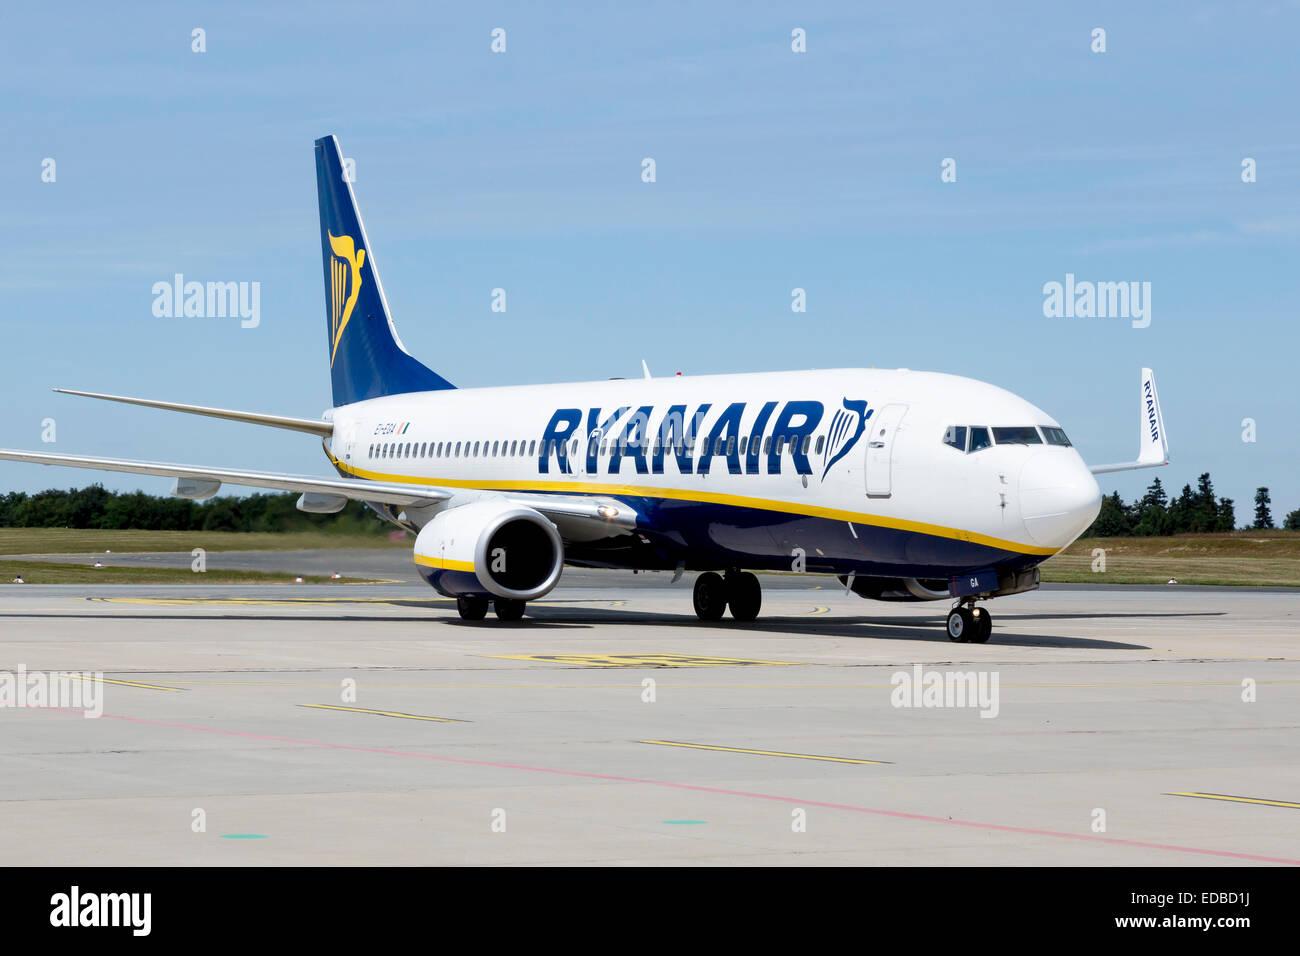 Boeing 737-800 of low-cost airline Ryanair at Frankfurt-Hahn Airport, Hahn Airport near Simmern, Rhineland-Palatinate, - Stock Image